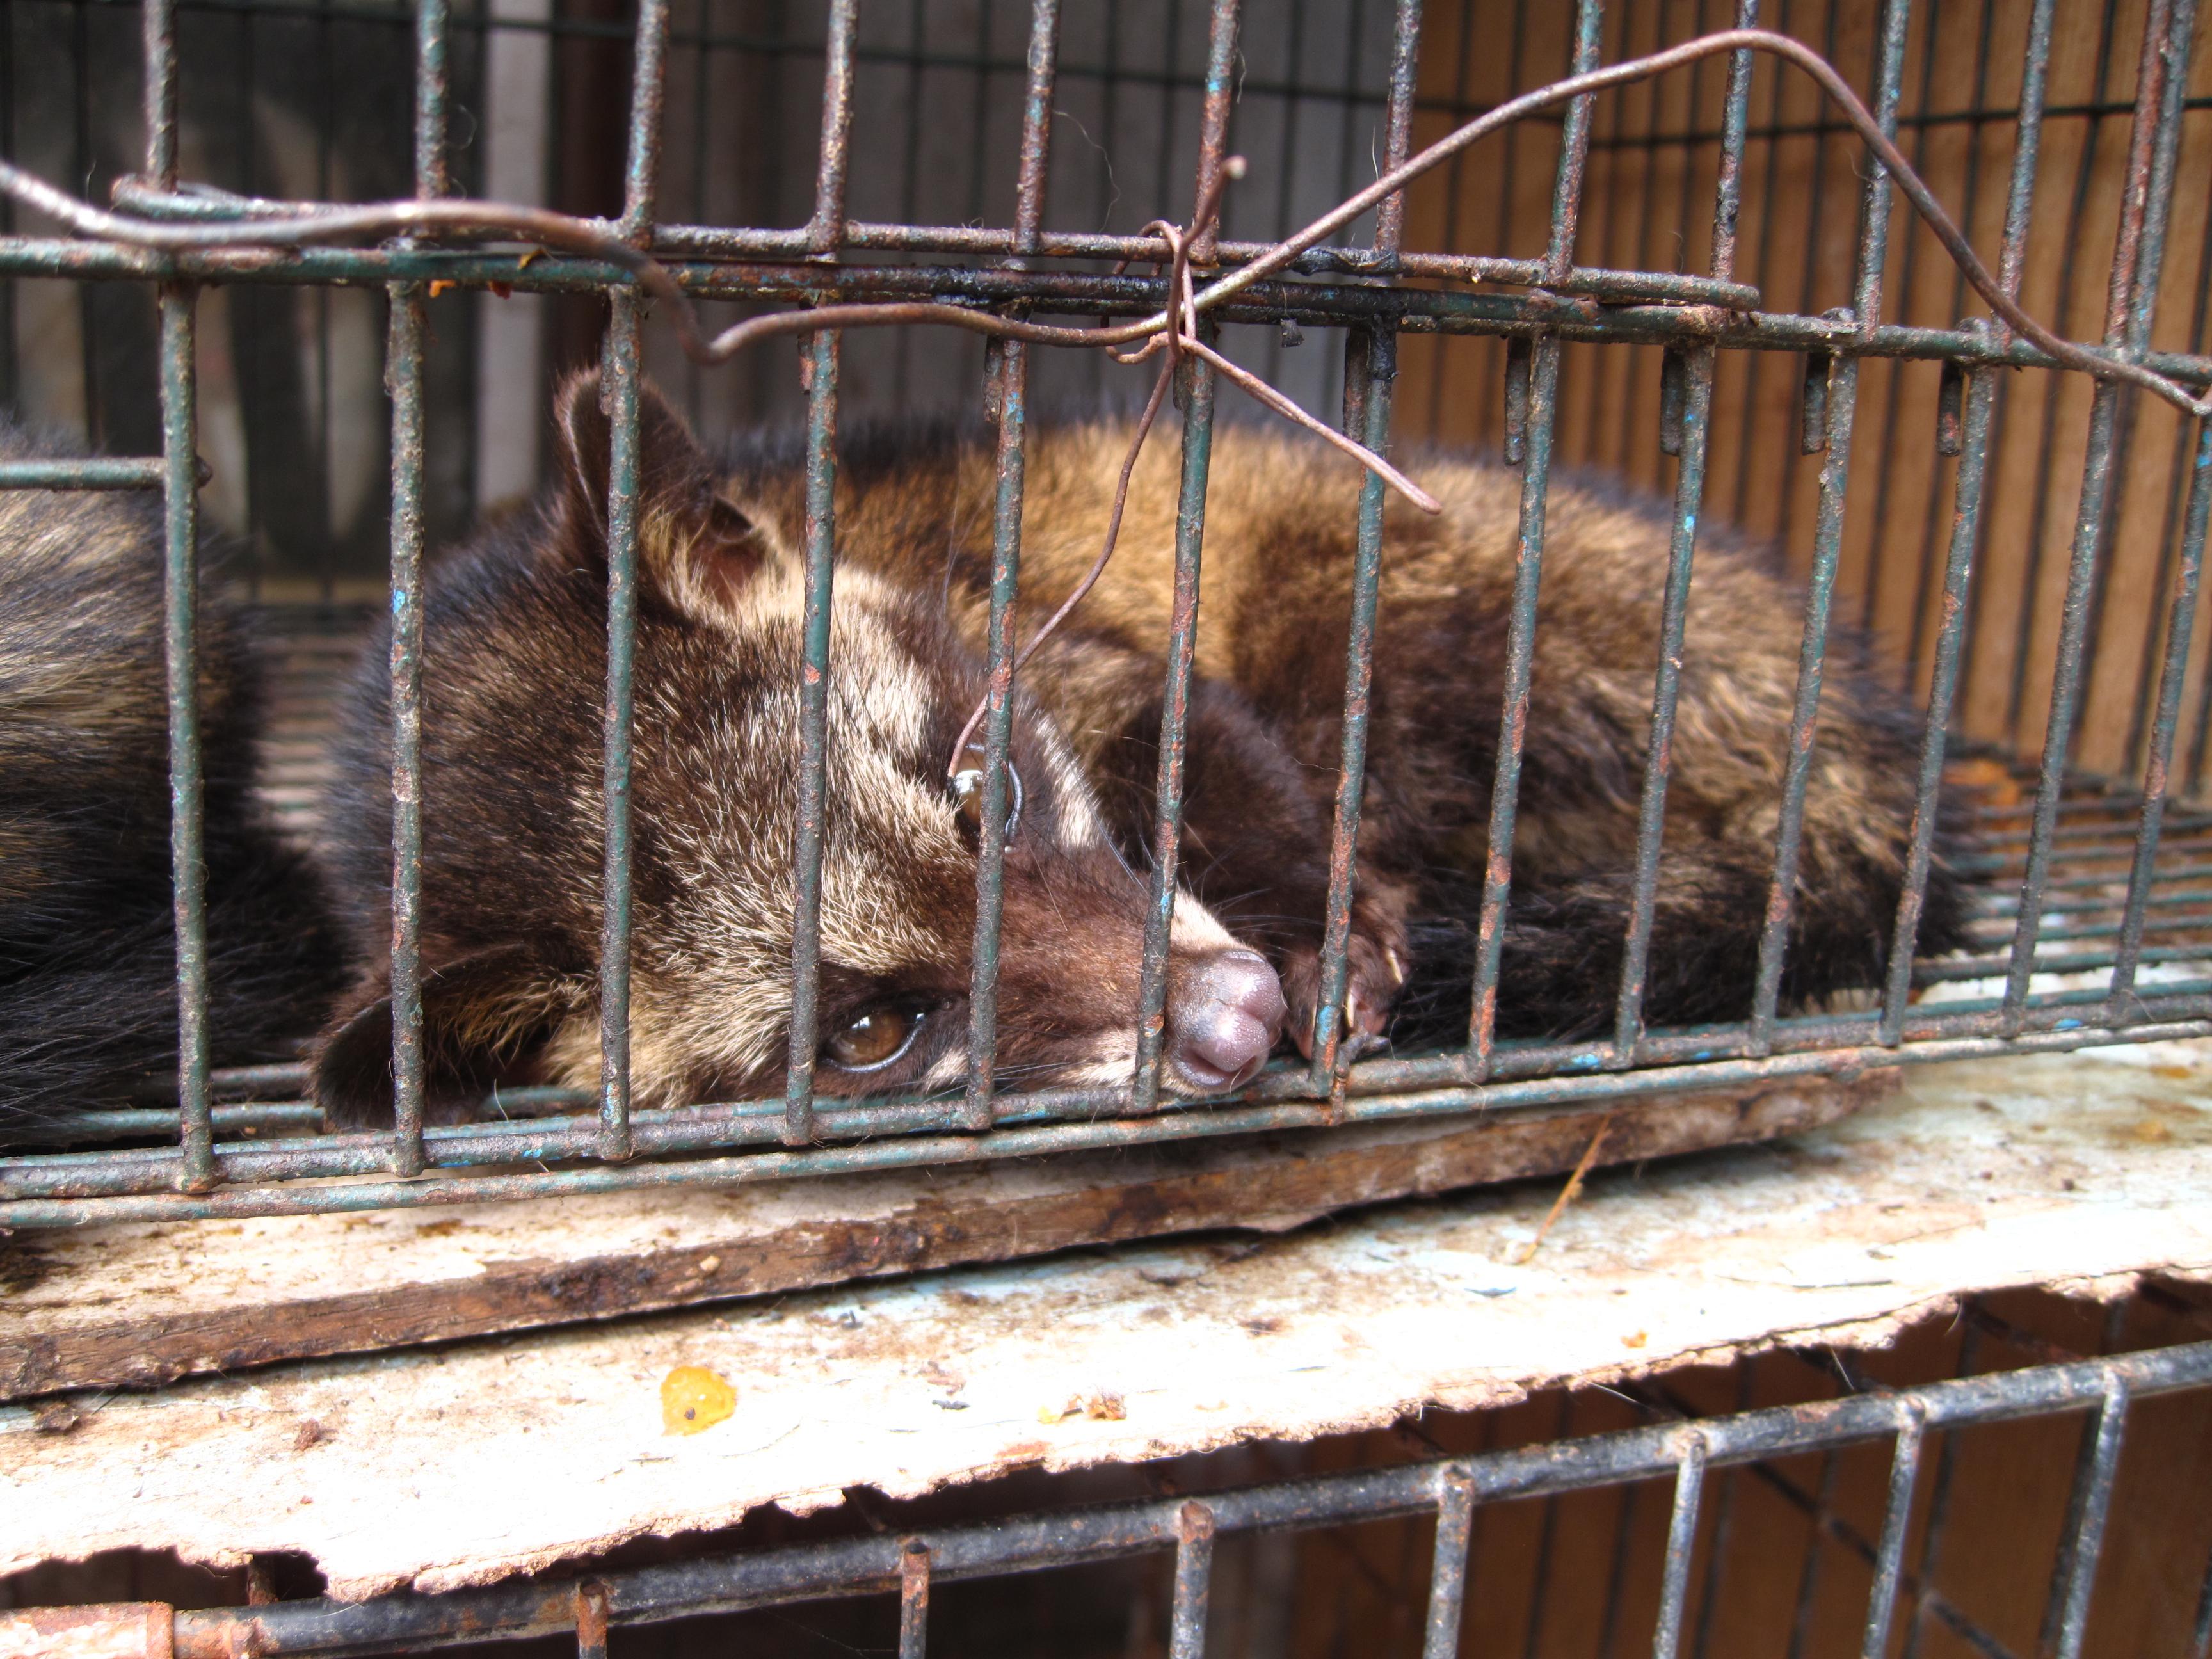 https://upload.wikimedia.org/wikipedia/commons/3/3b/Luwak_%28civet_cat%29_in_cage.jpg